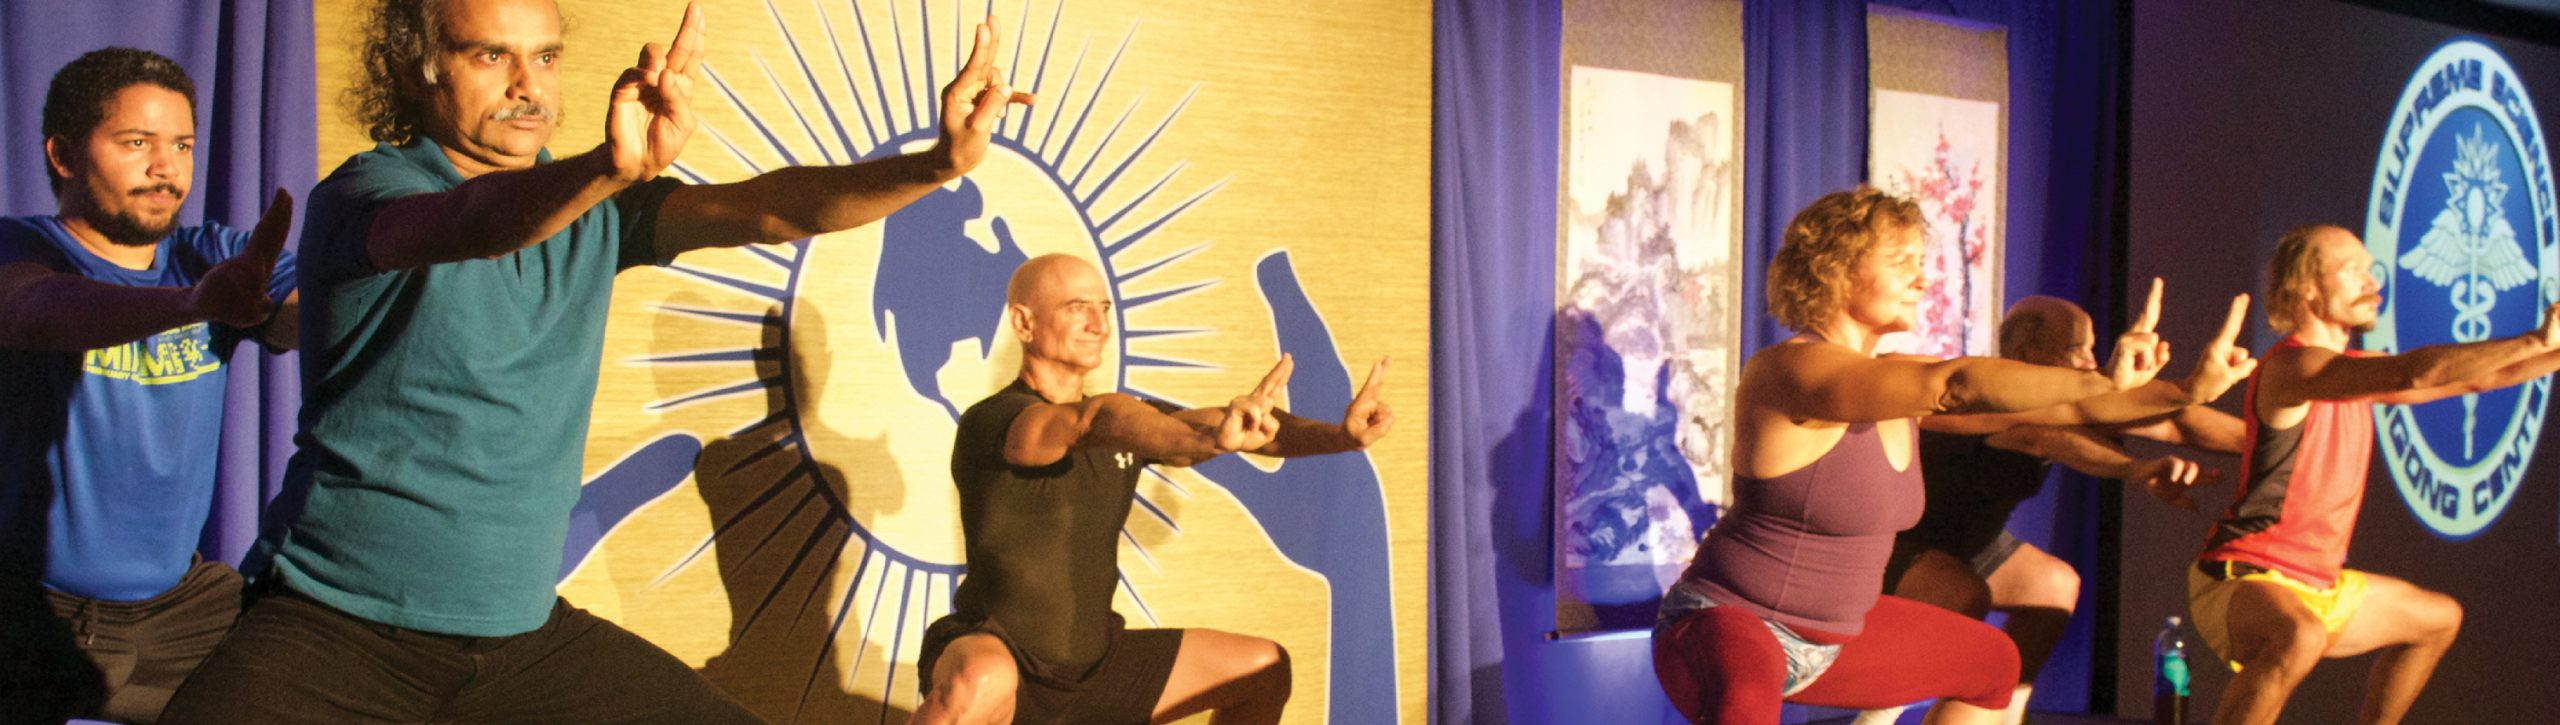 Qigong Improves Muscular Endurance and Bone Density...